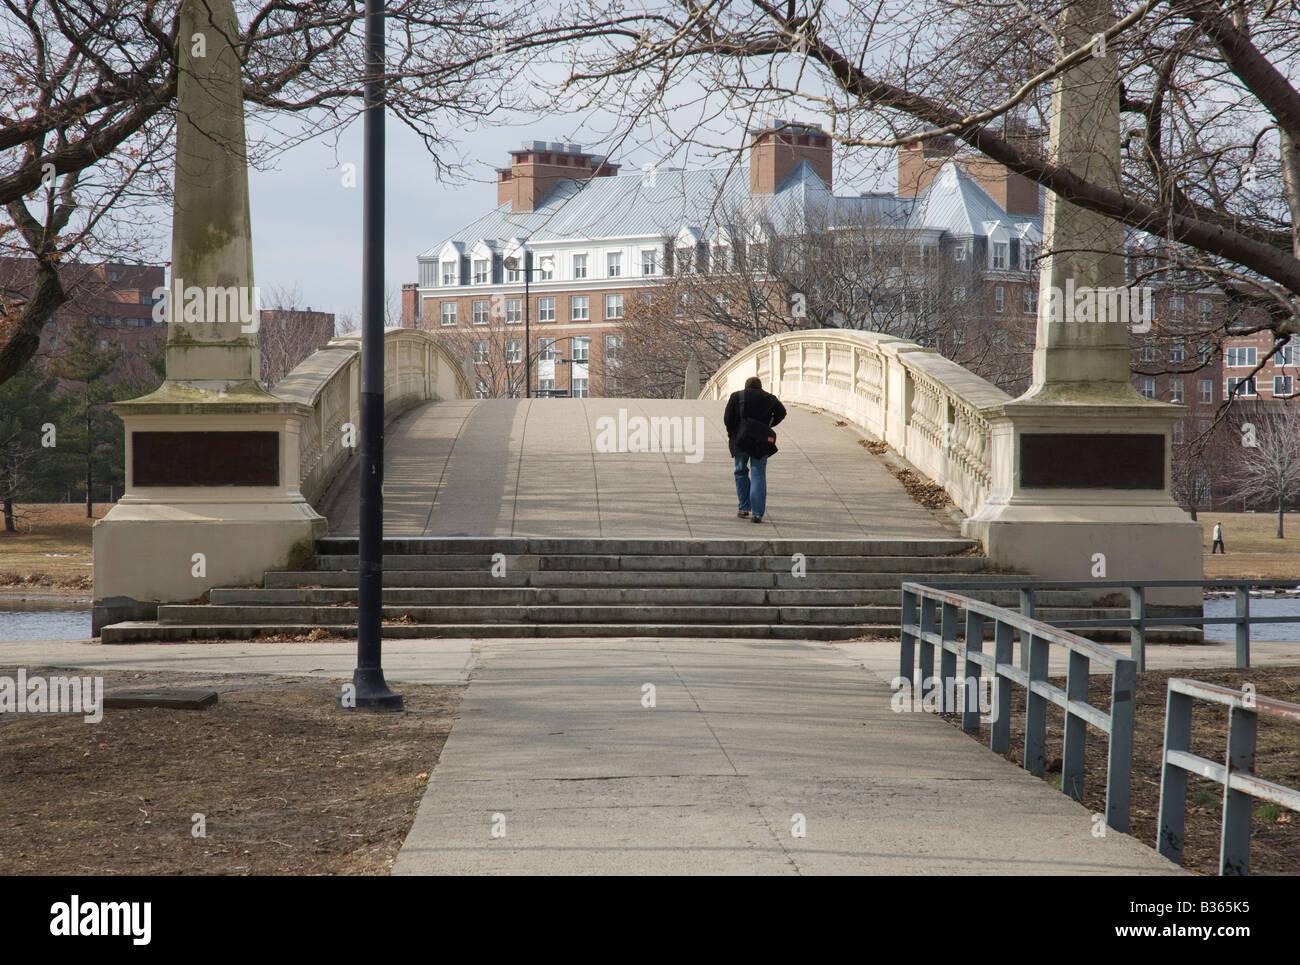 A man crosses the Weeks Memorial Footbridge at Harvard University in Cambridge Massachusetts - Stock Image